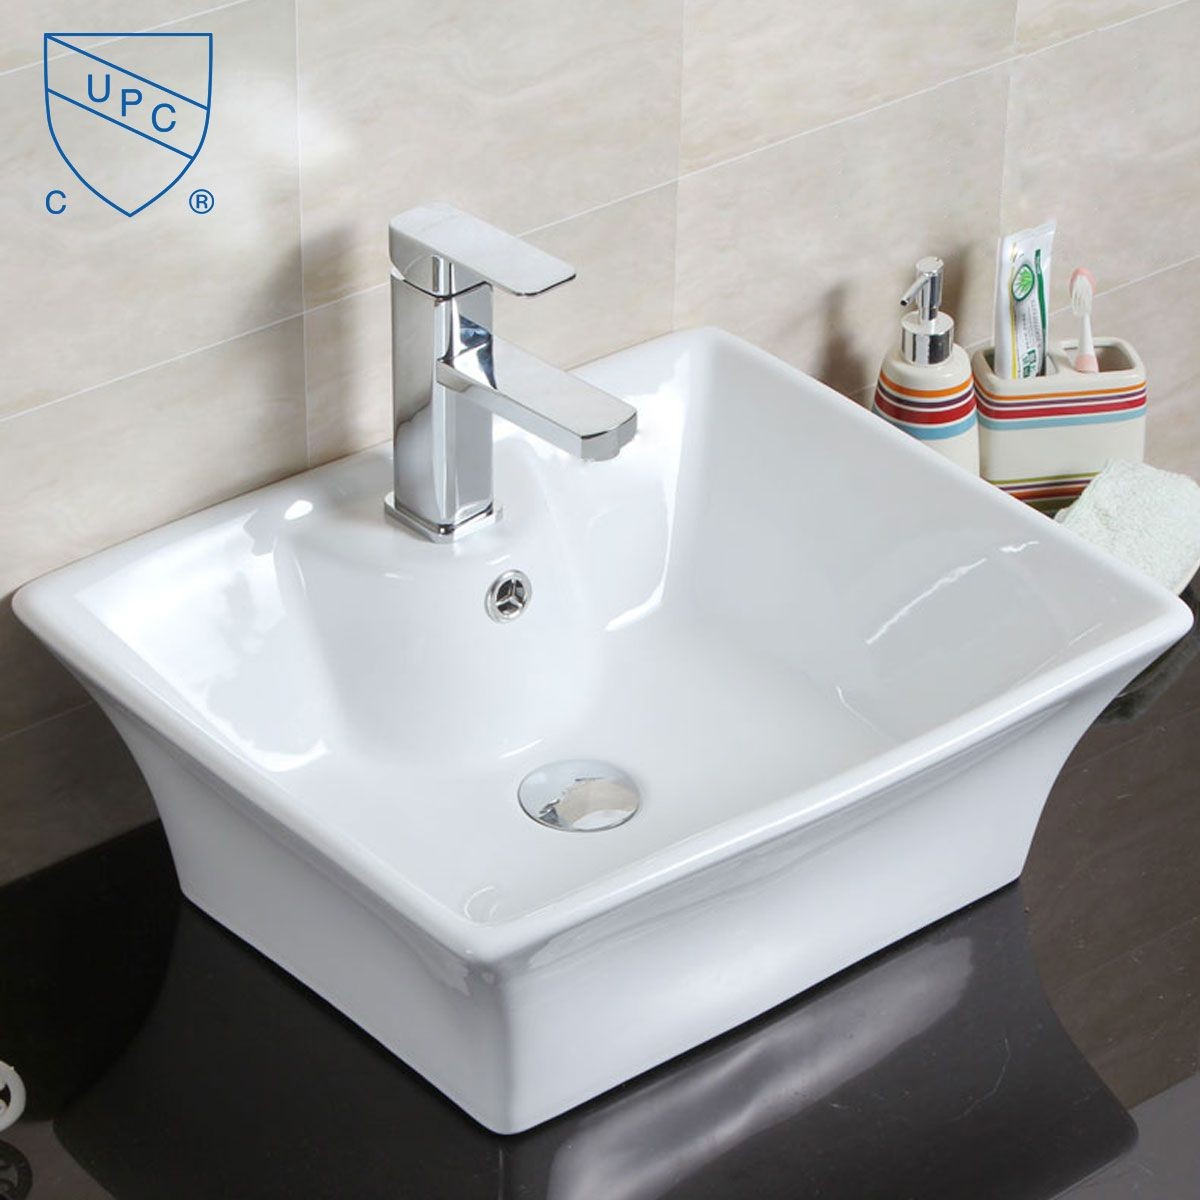 Decoraport White Rectangle Ceramic Above Counter Basin (CL-1097)